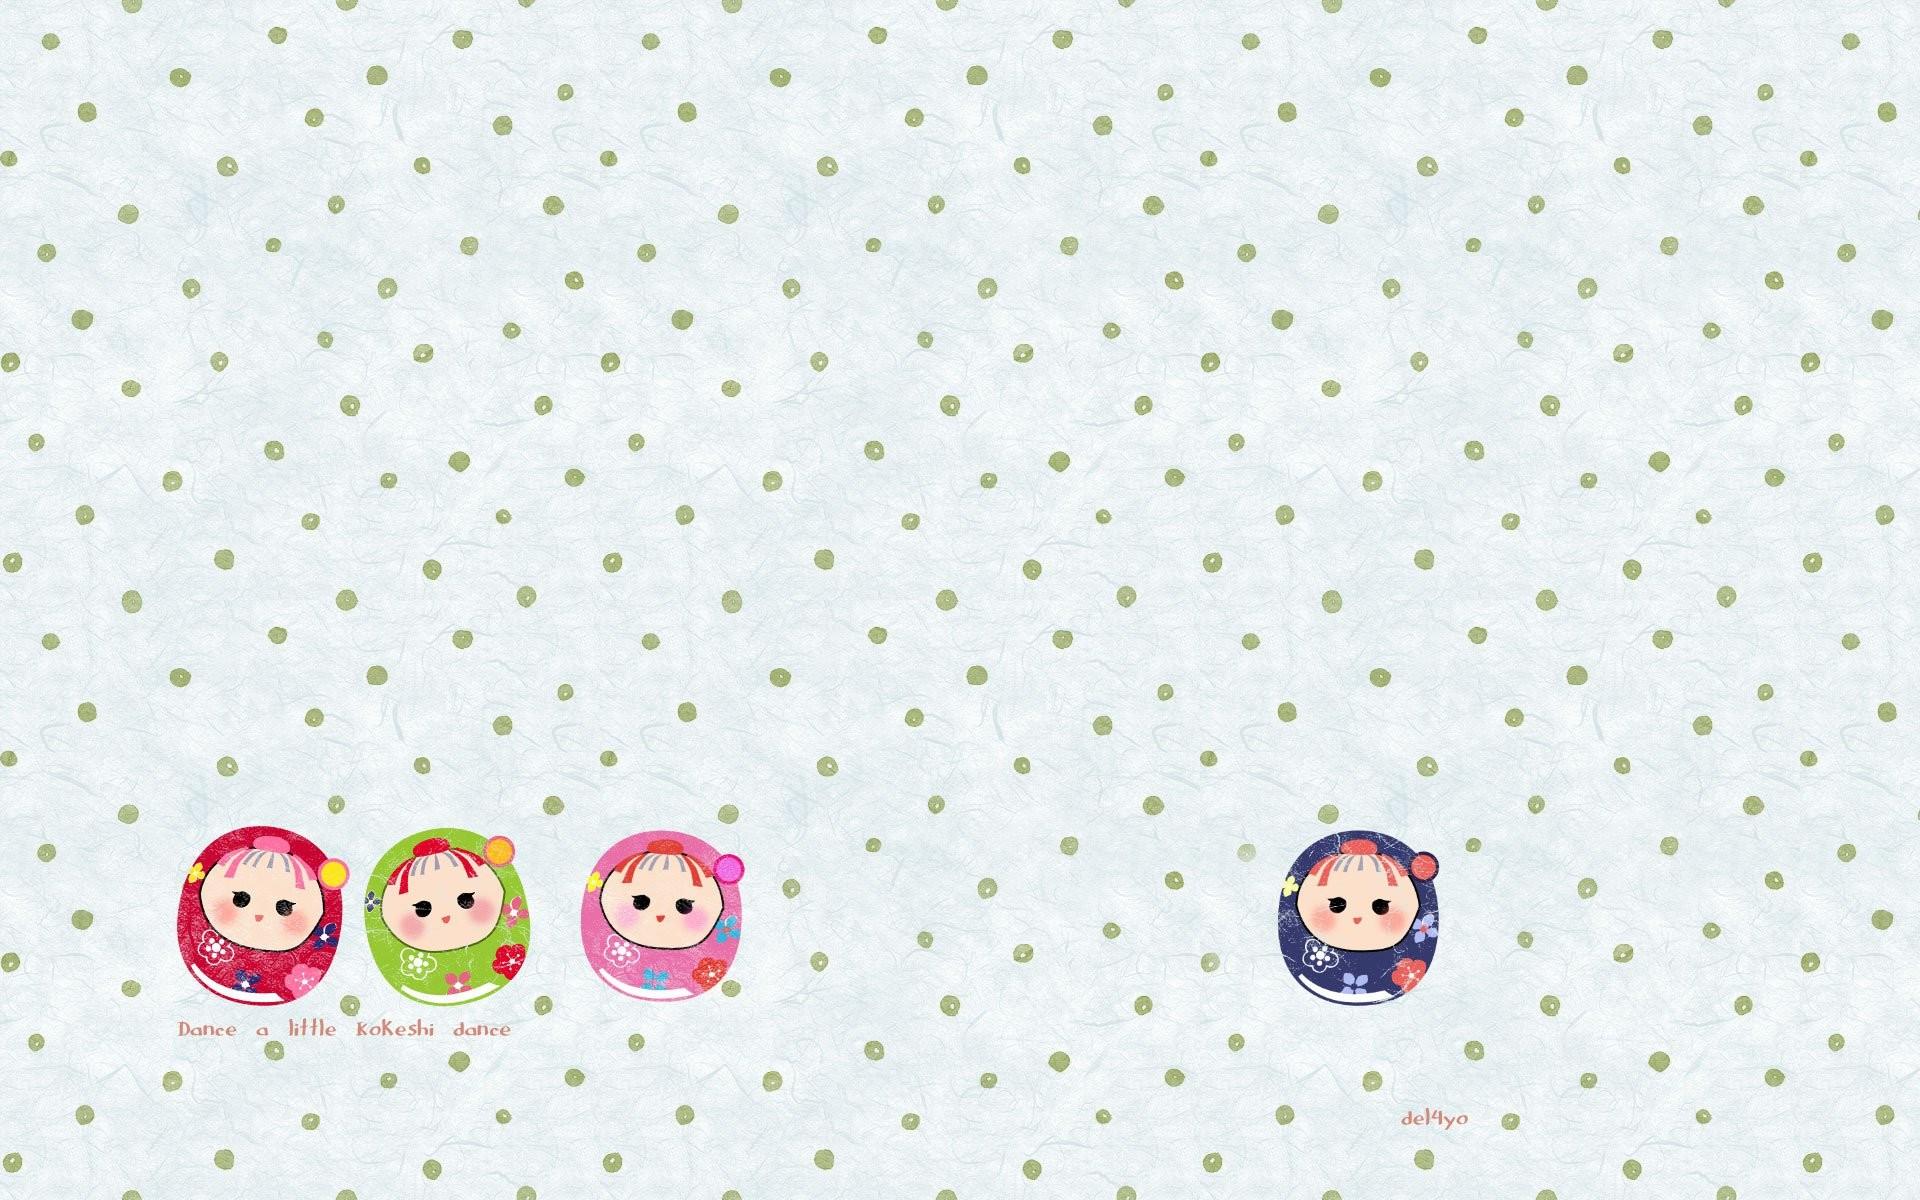 Free Kawaii Mobile & Desktop Wallpapers – Super Cute Kawaii!